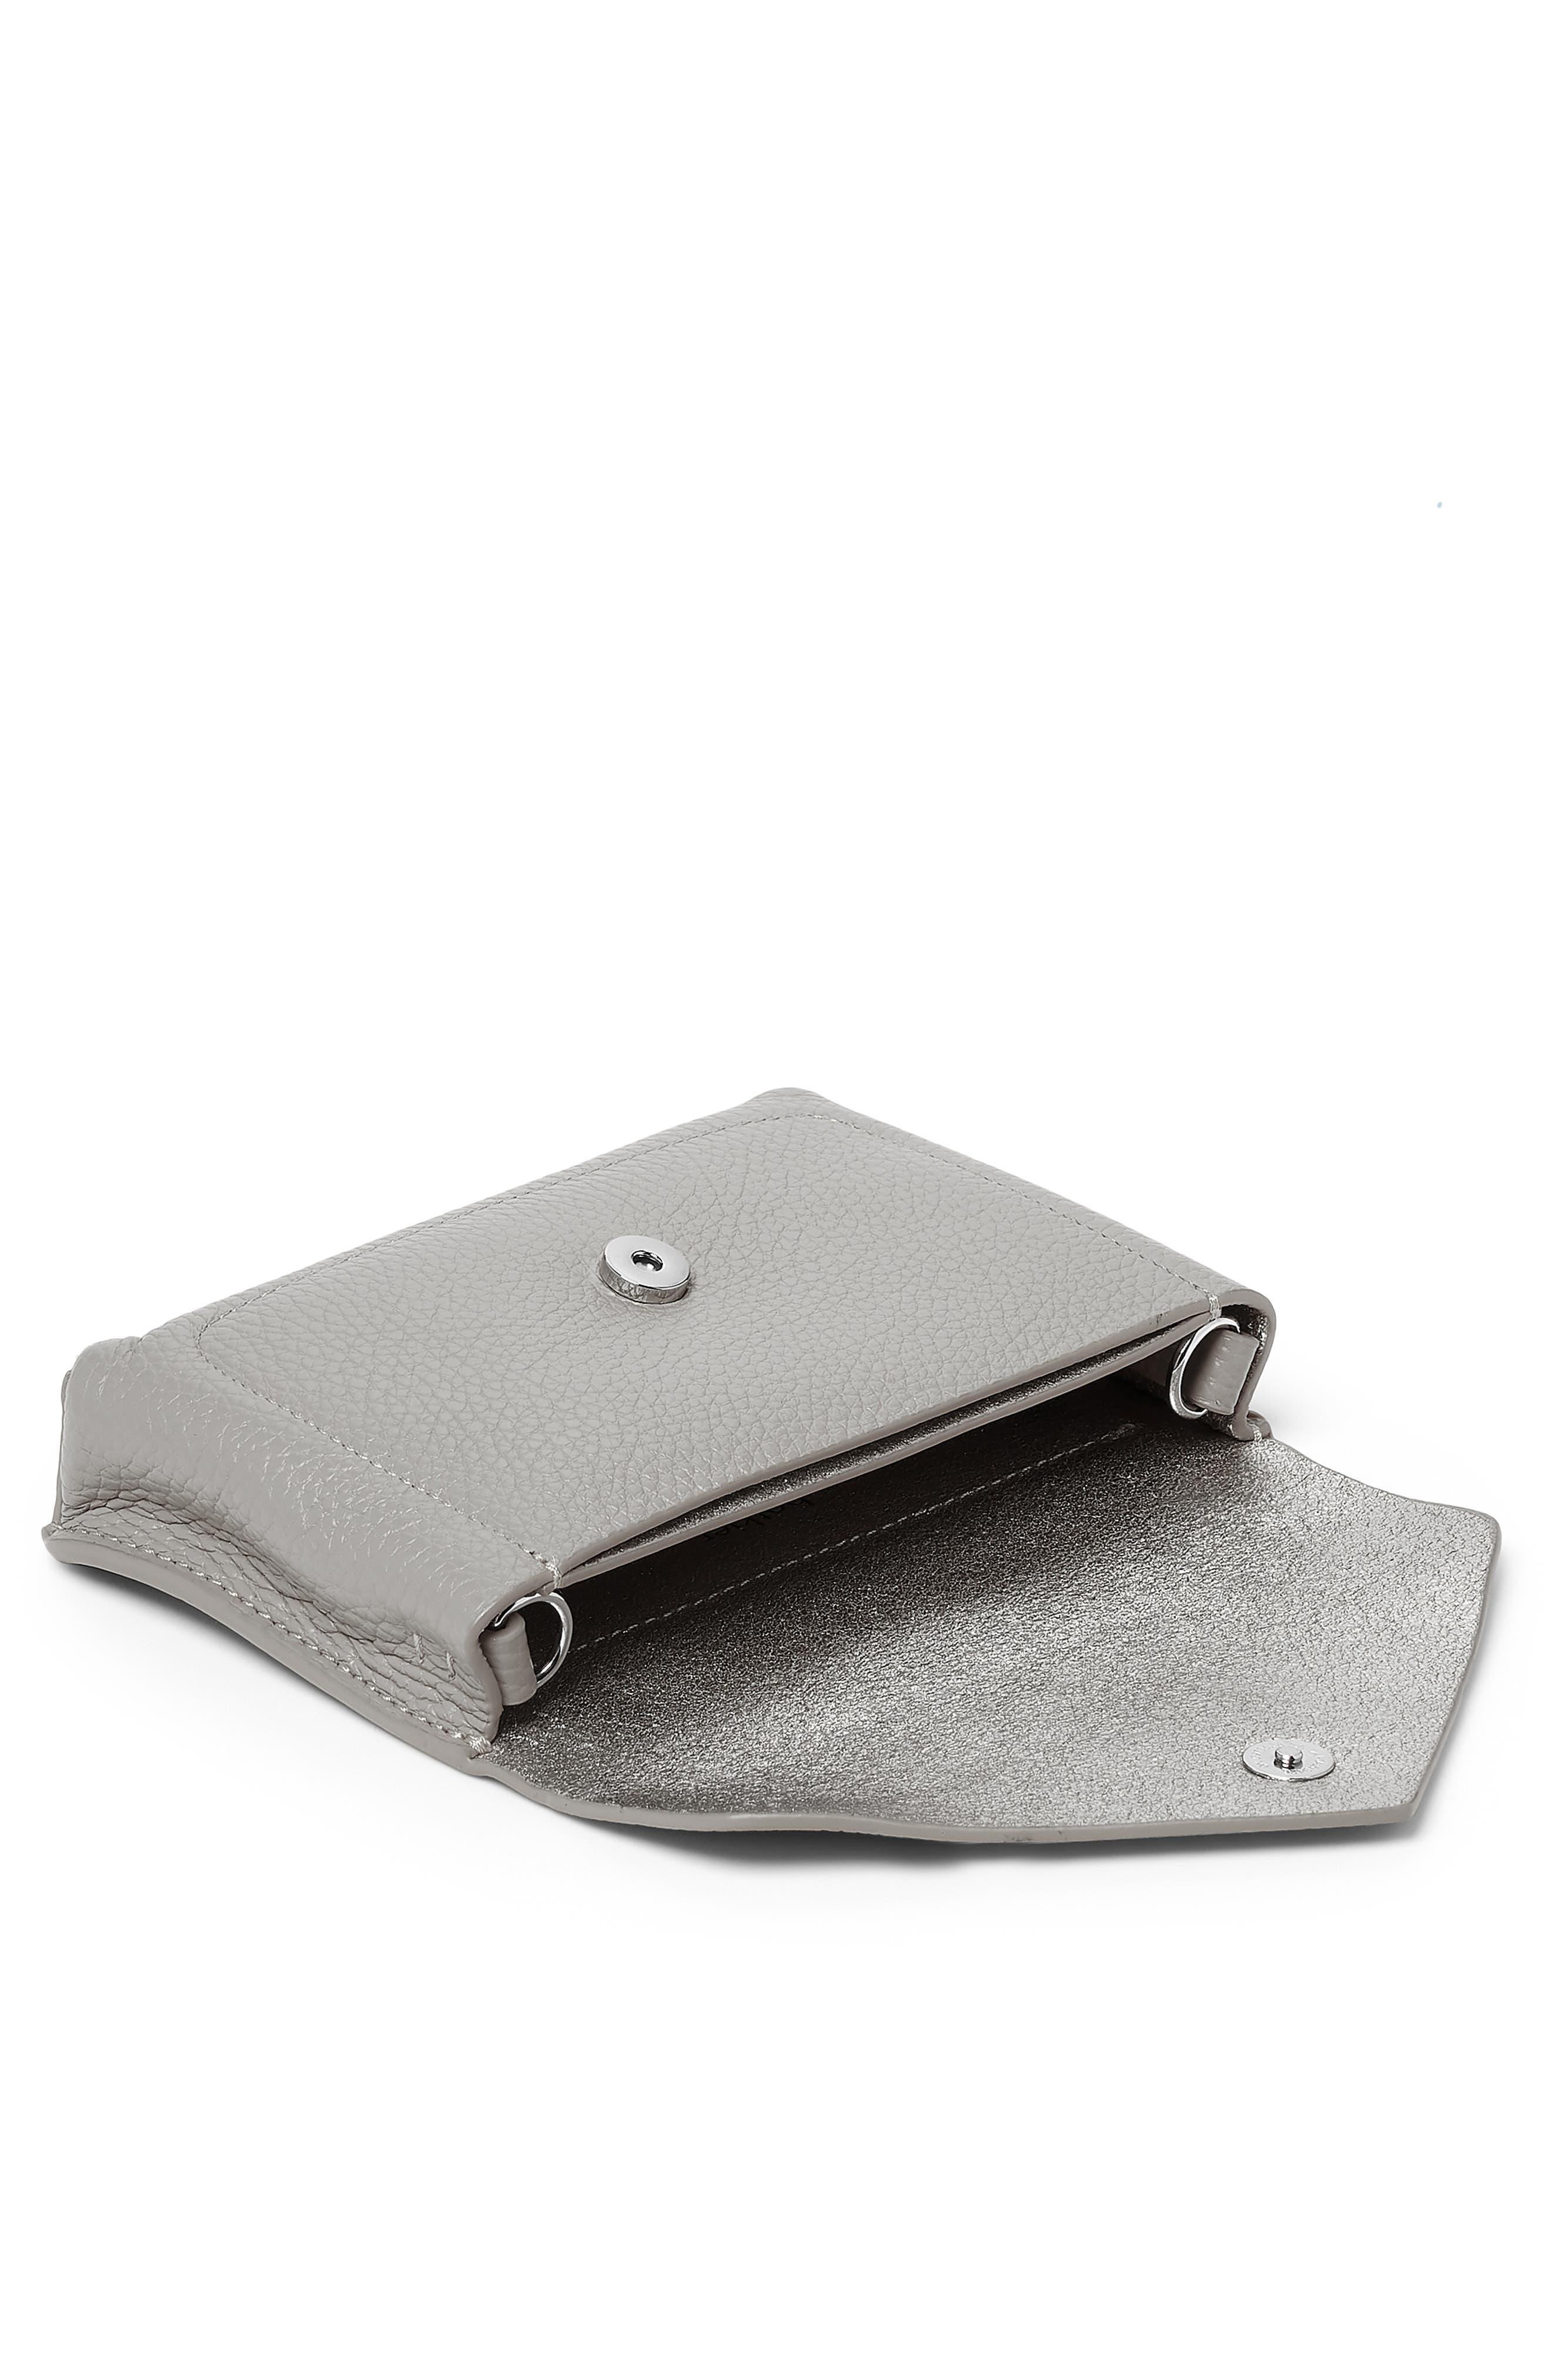 BOTKIER,                             Vivi Calfskin Leather Belt Bag,                             Alternate thumbnail 3, color,                             SILVER GREY